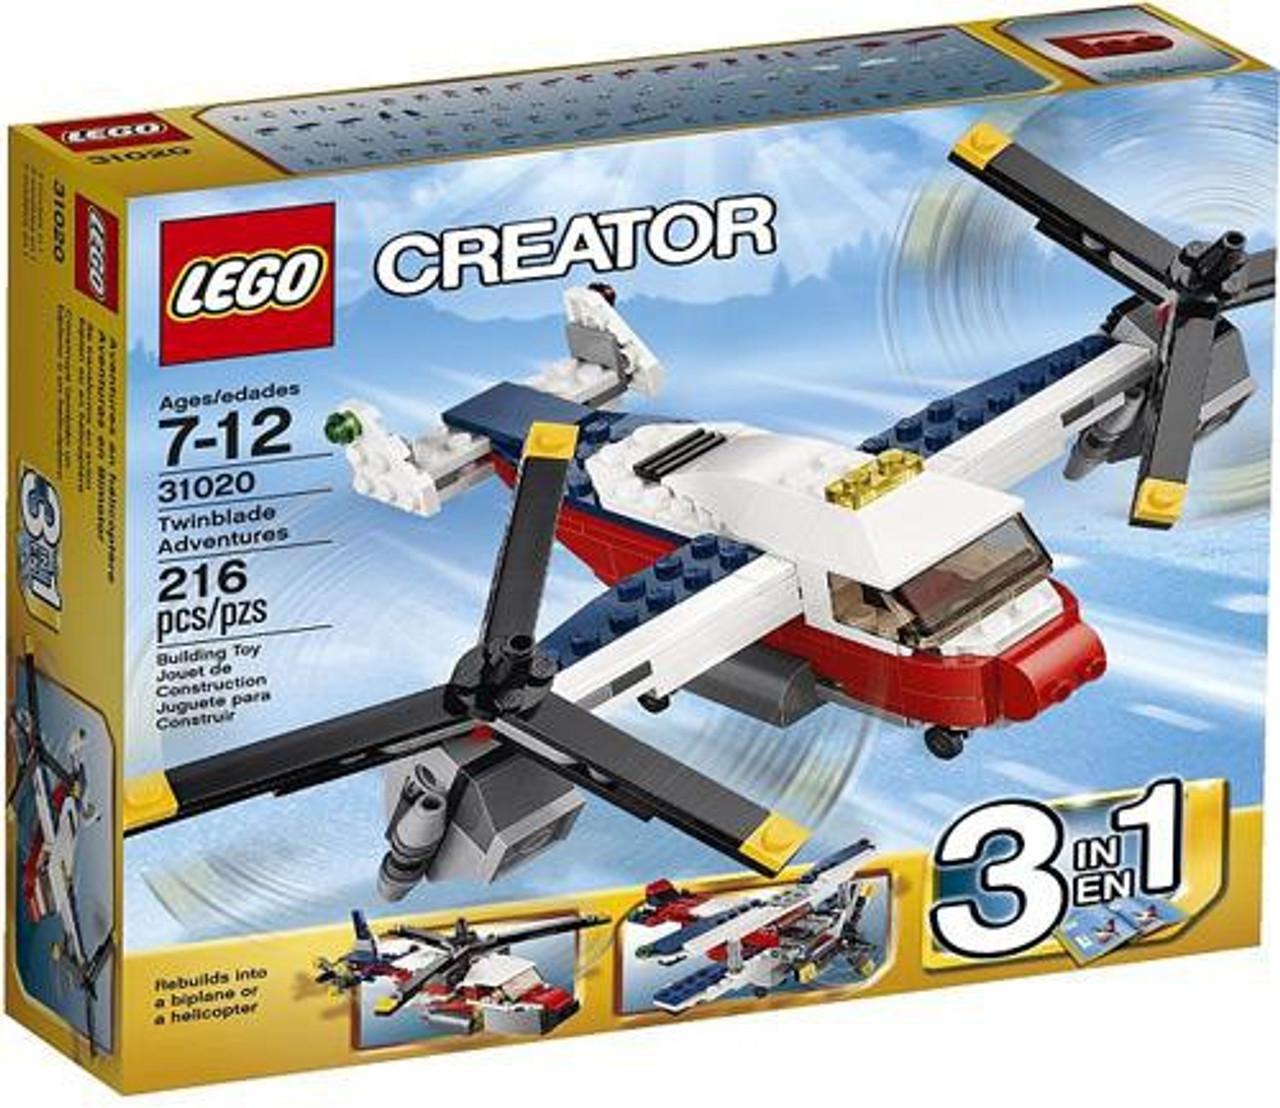 LEGO Creator Twinblade Adventures Set #31020